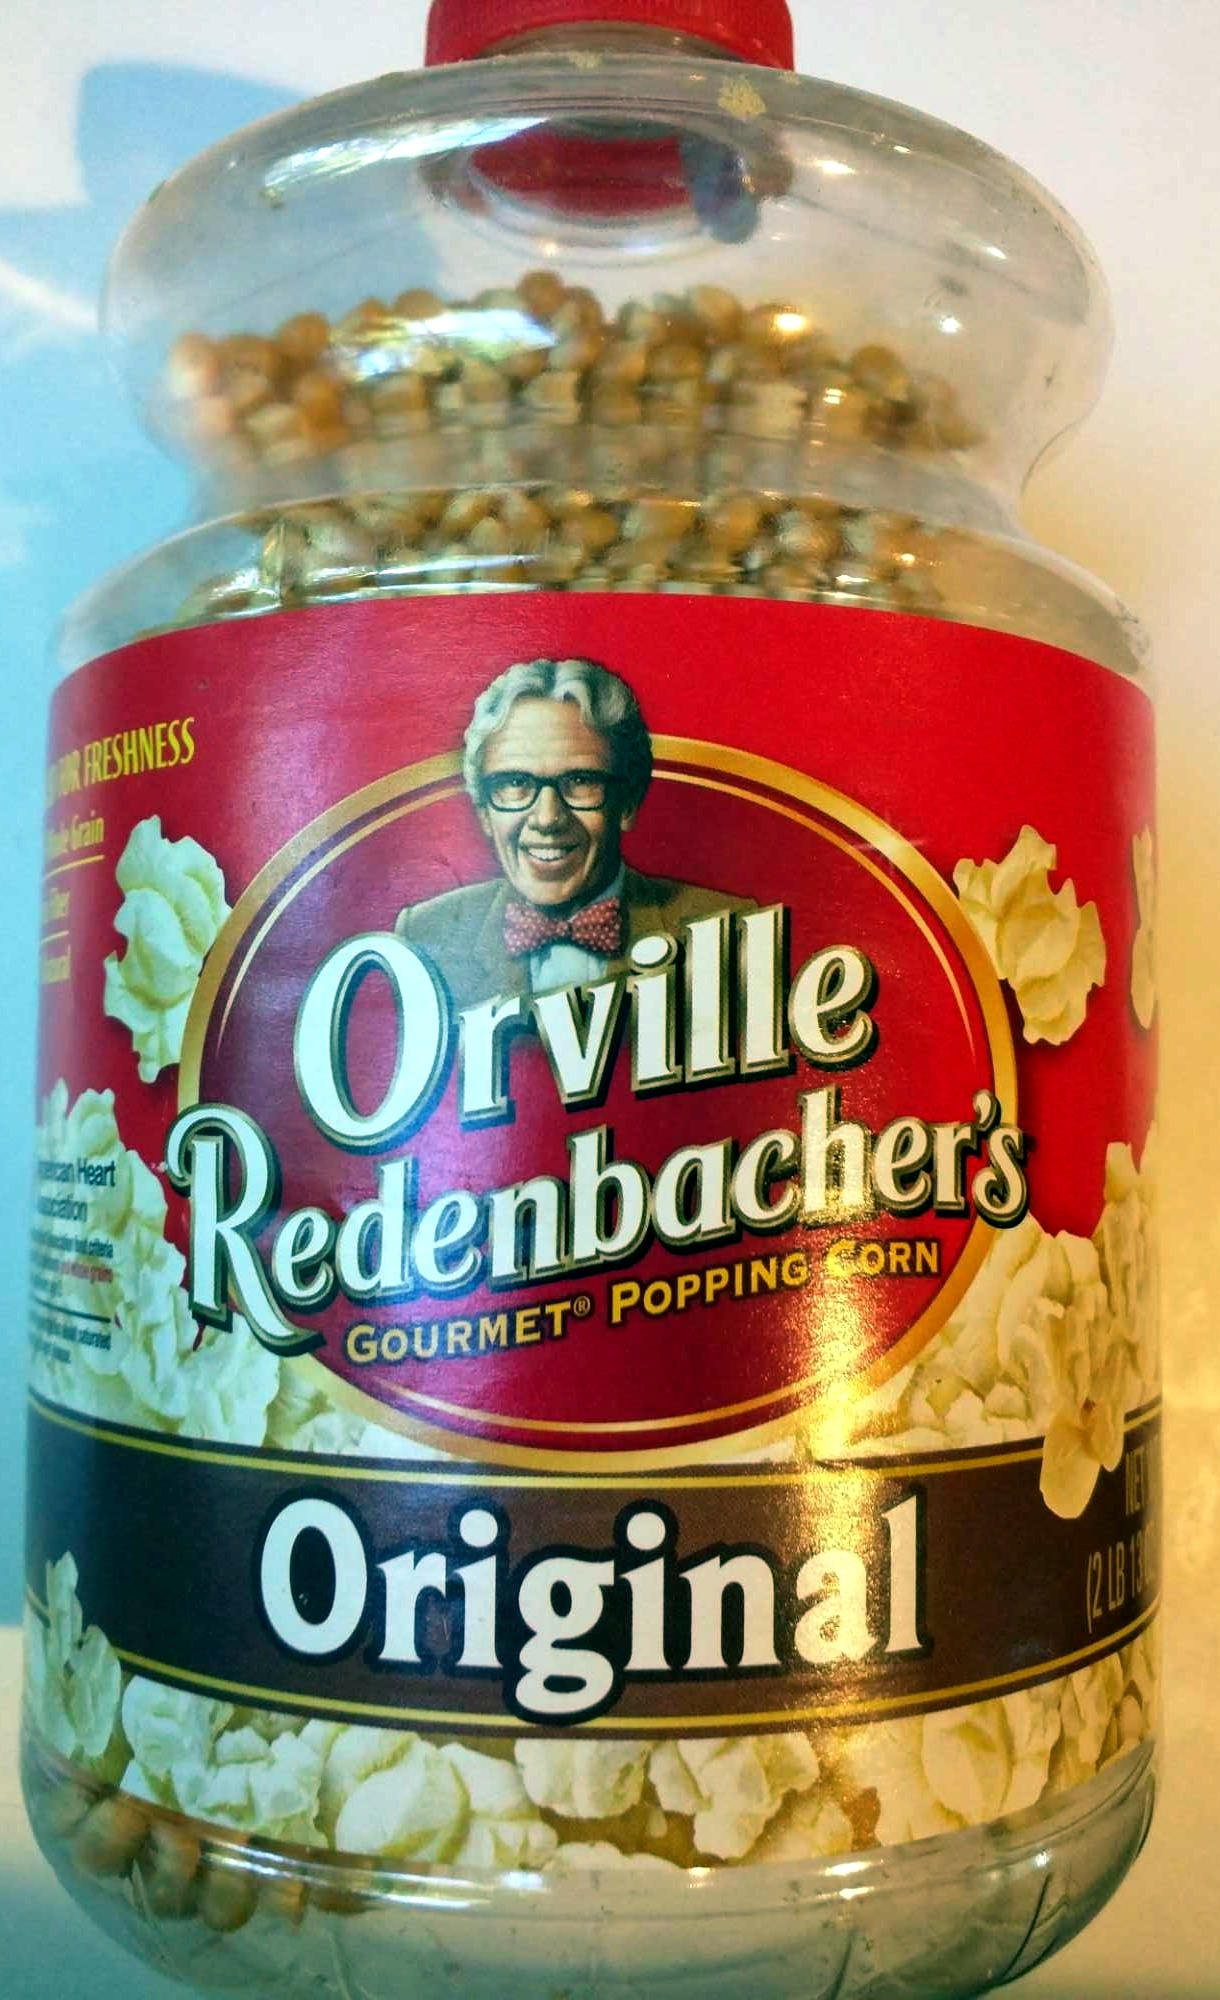 Original Gourmet Popping Corn - Produit